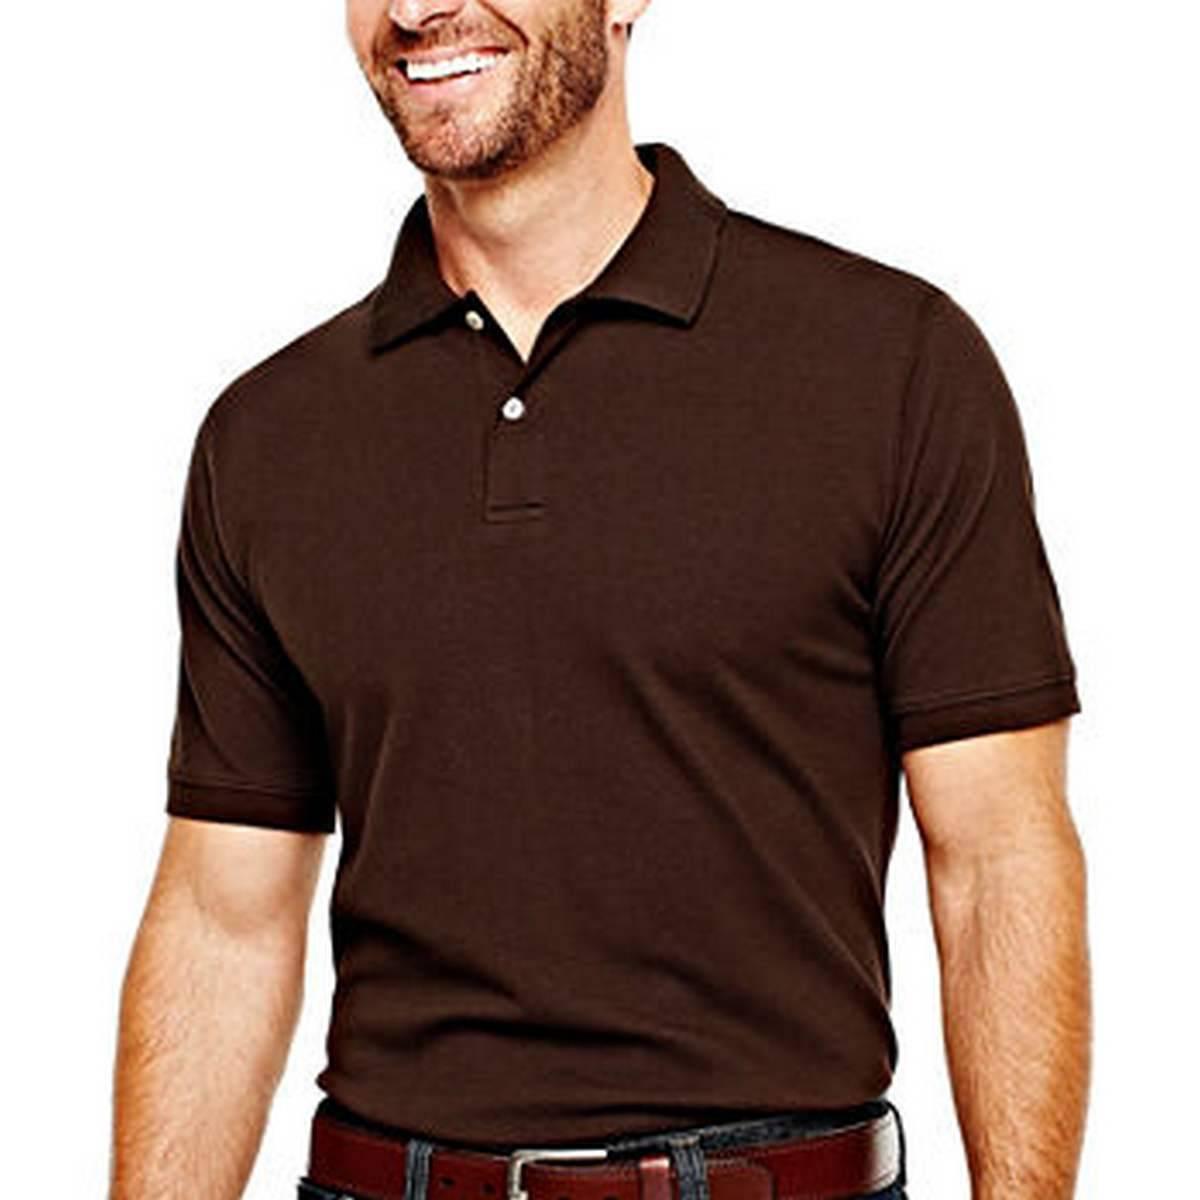 Plain Brown Polo T Shirt For Men (High Quality Fabric)